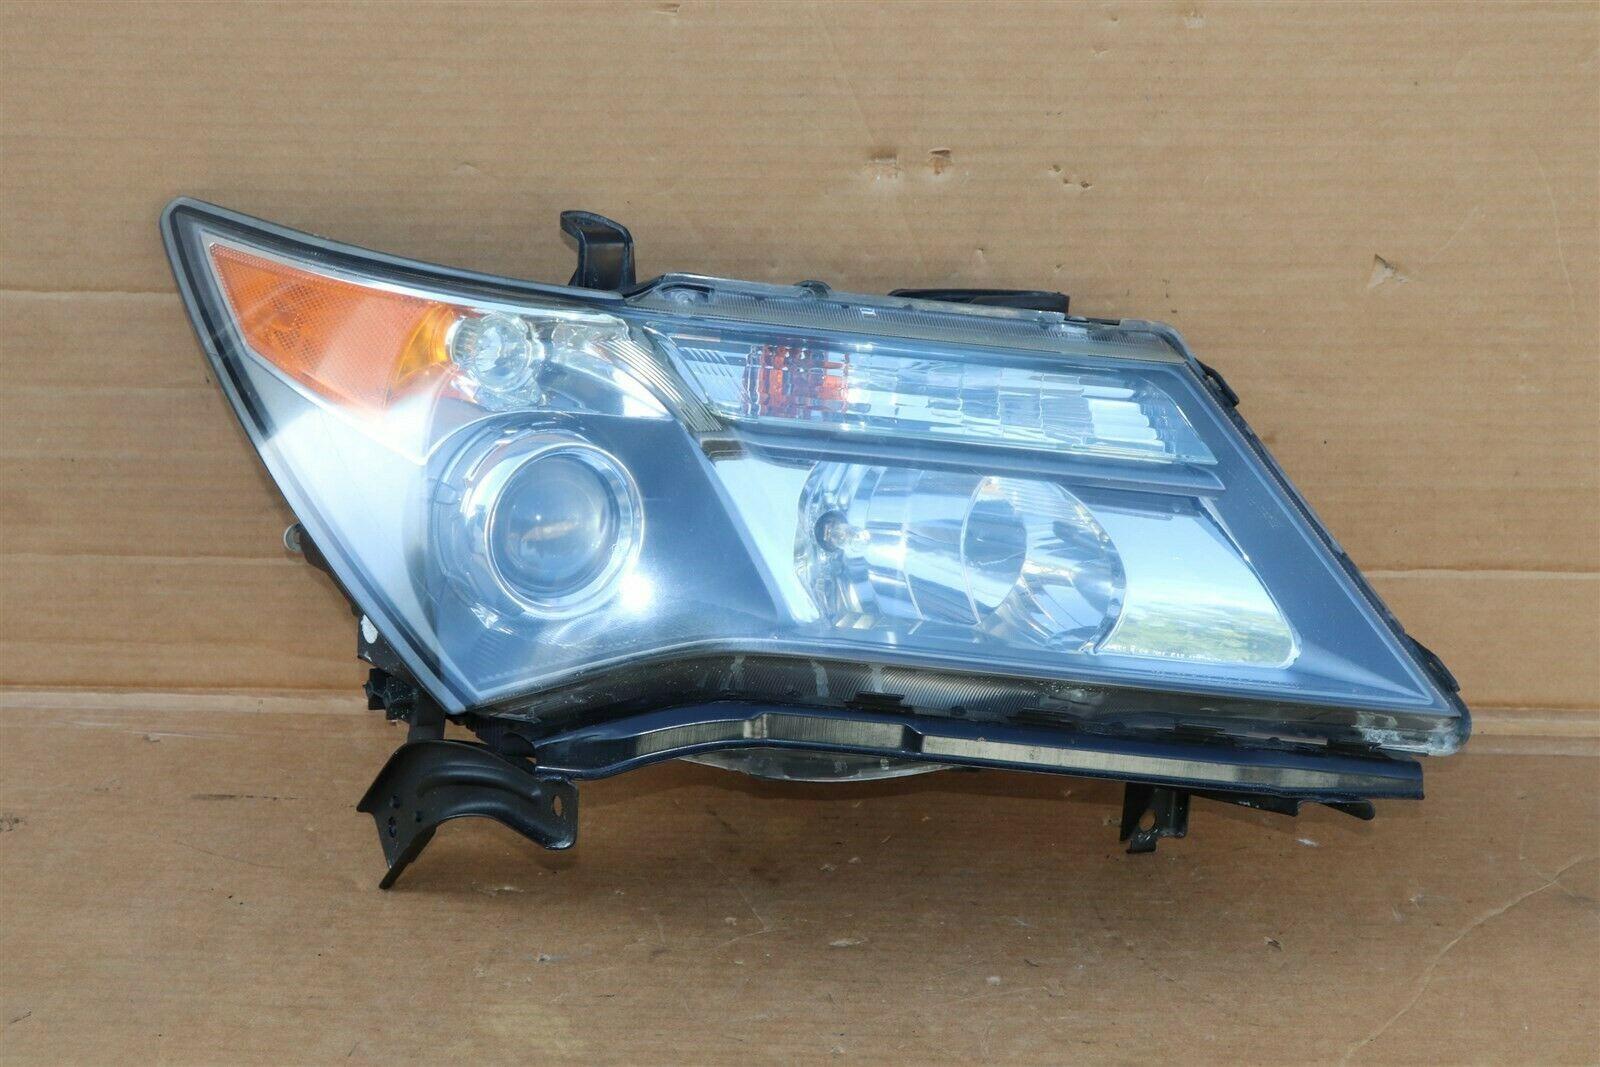 07-09 Acura MDX XENON HID Headlight Lamp Passenger Right RH - POLISHED